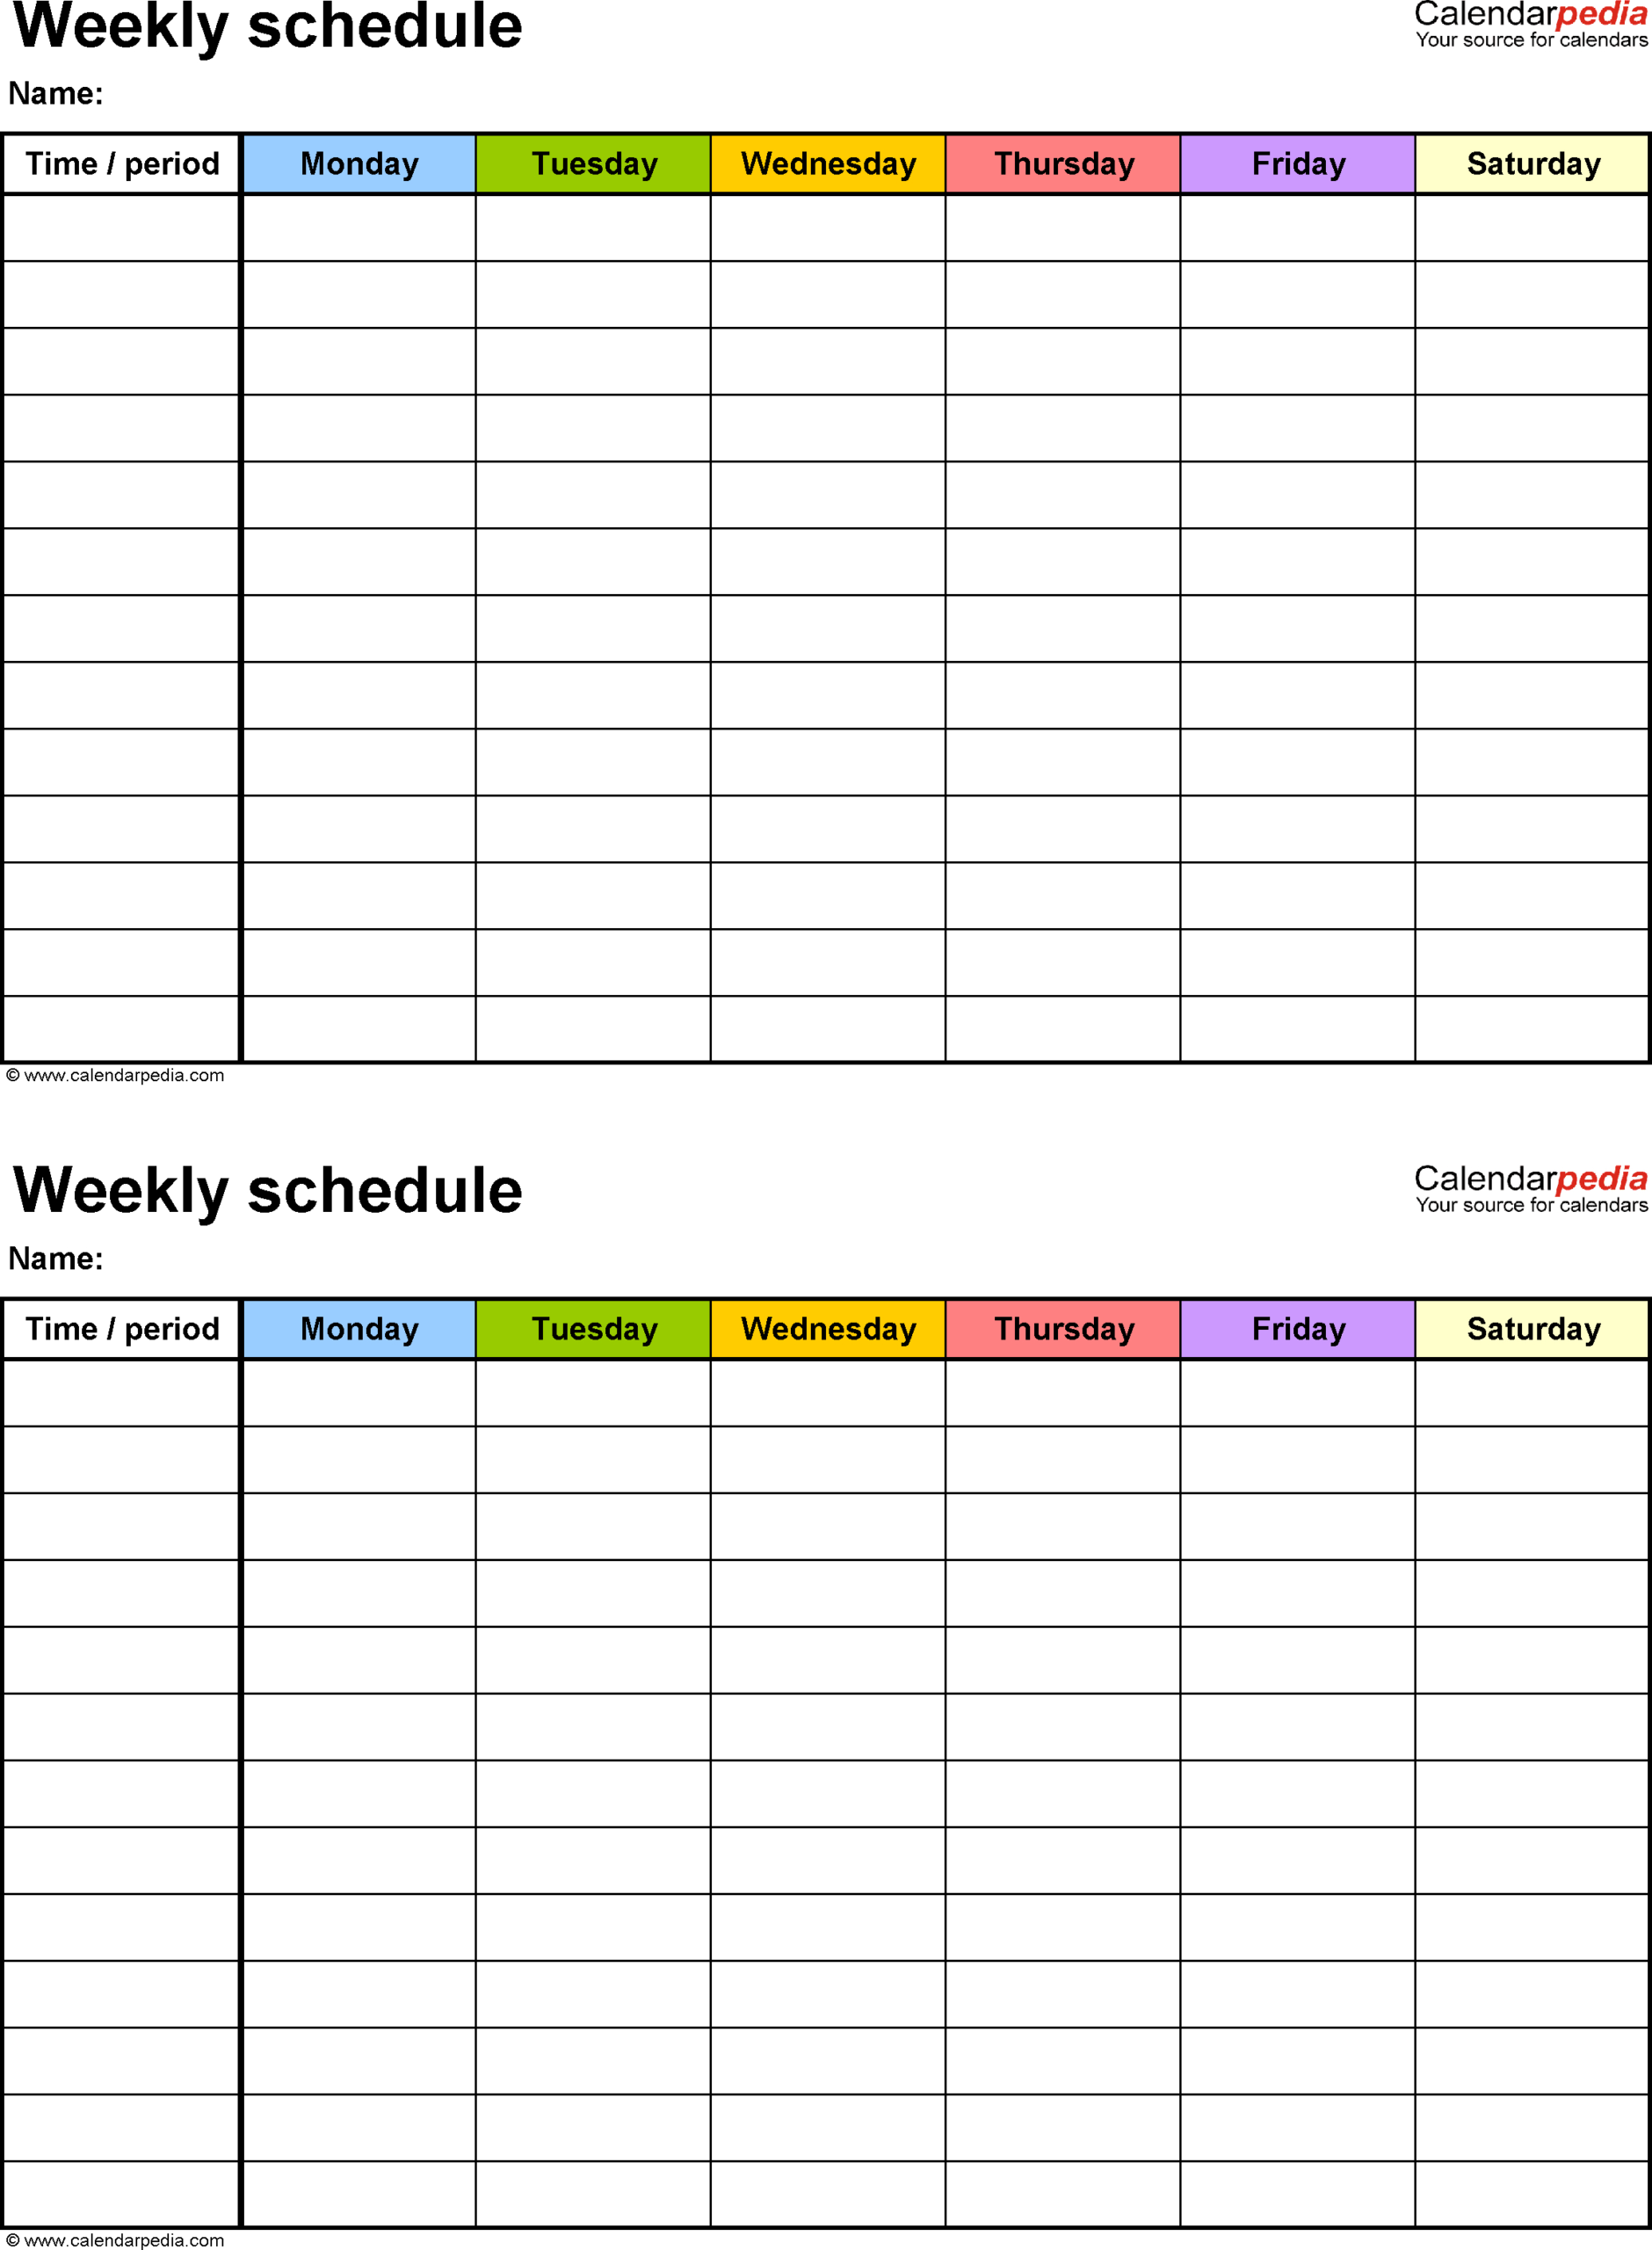 Sunday Through Saturday Schedule Template | Calendar For inside Monday Through Saturday Calendar